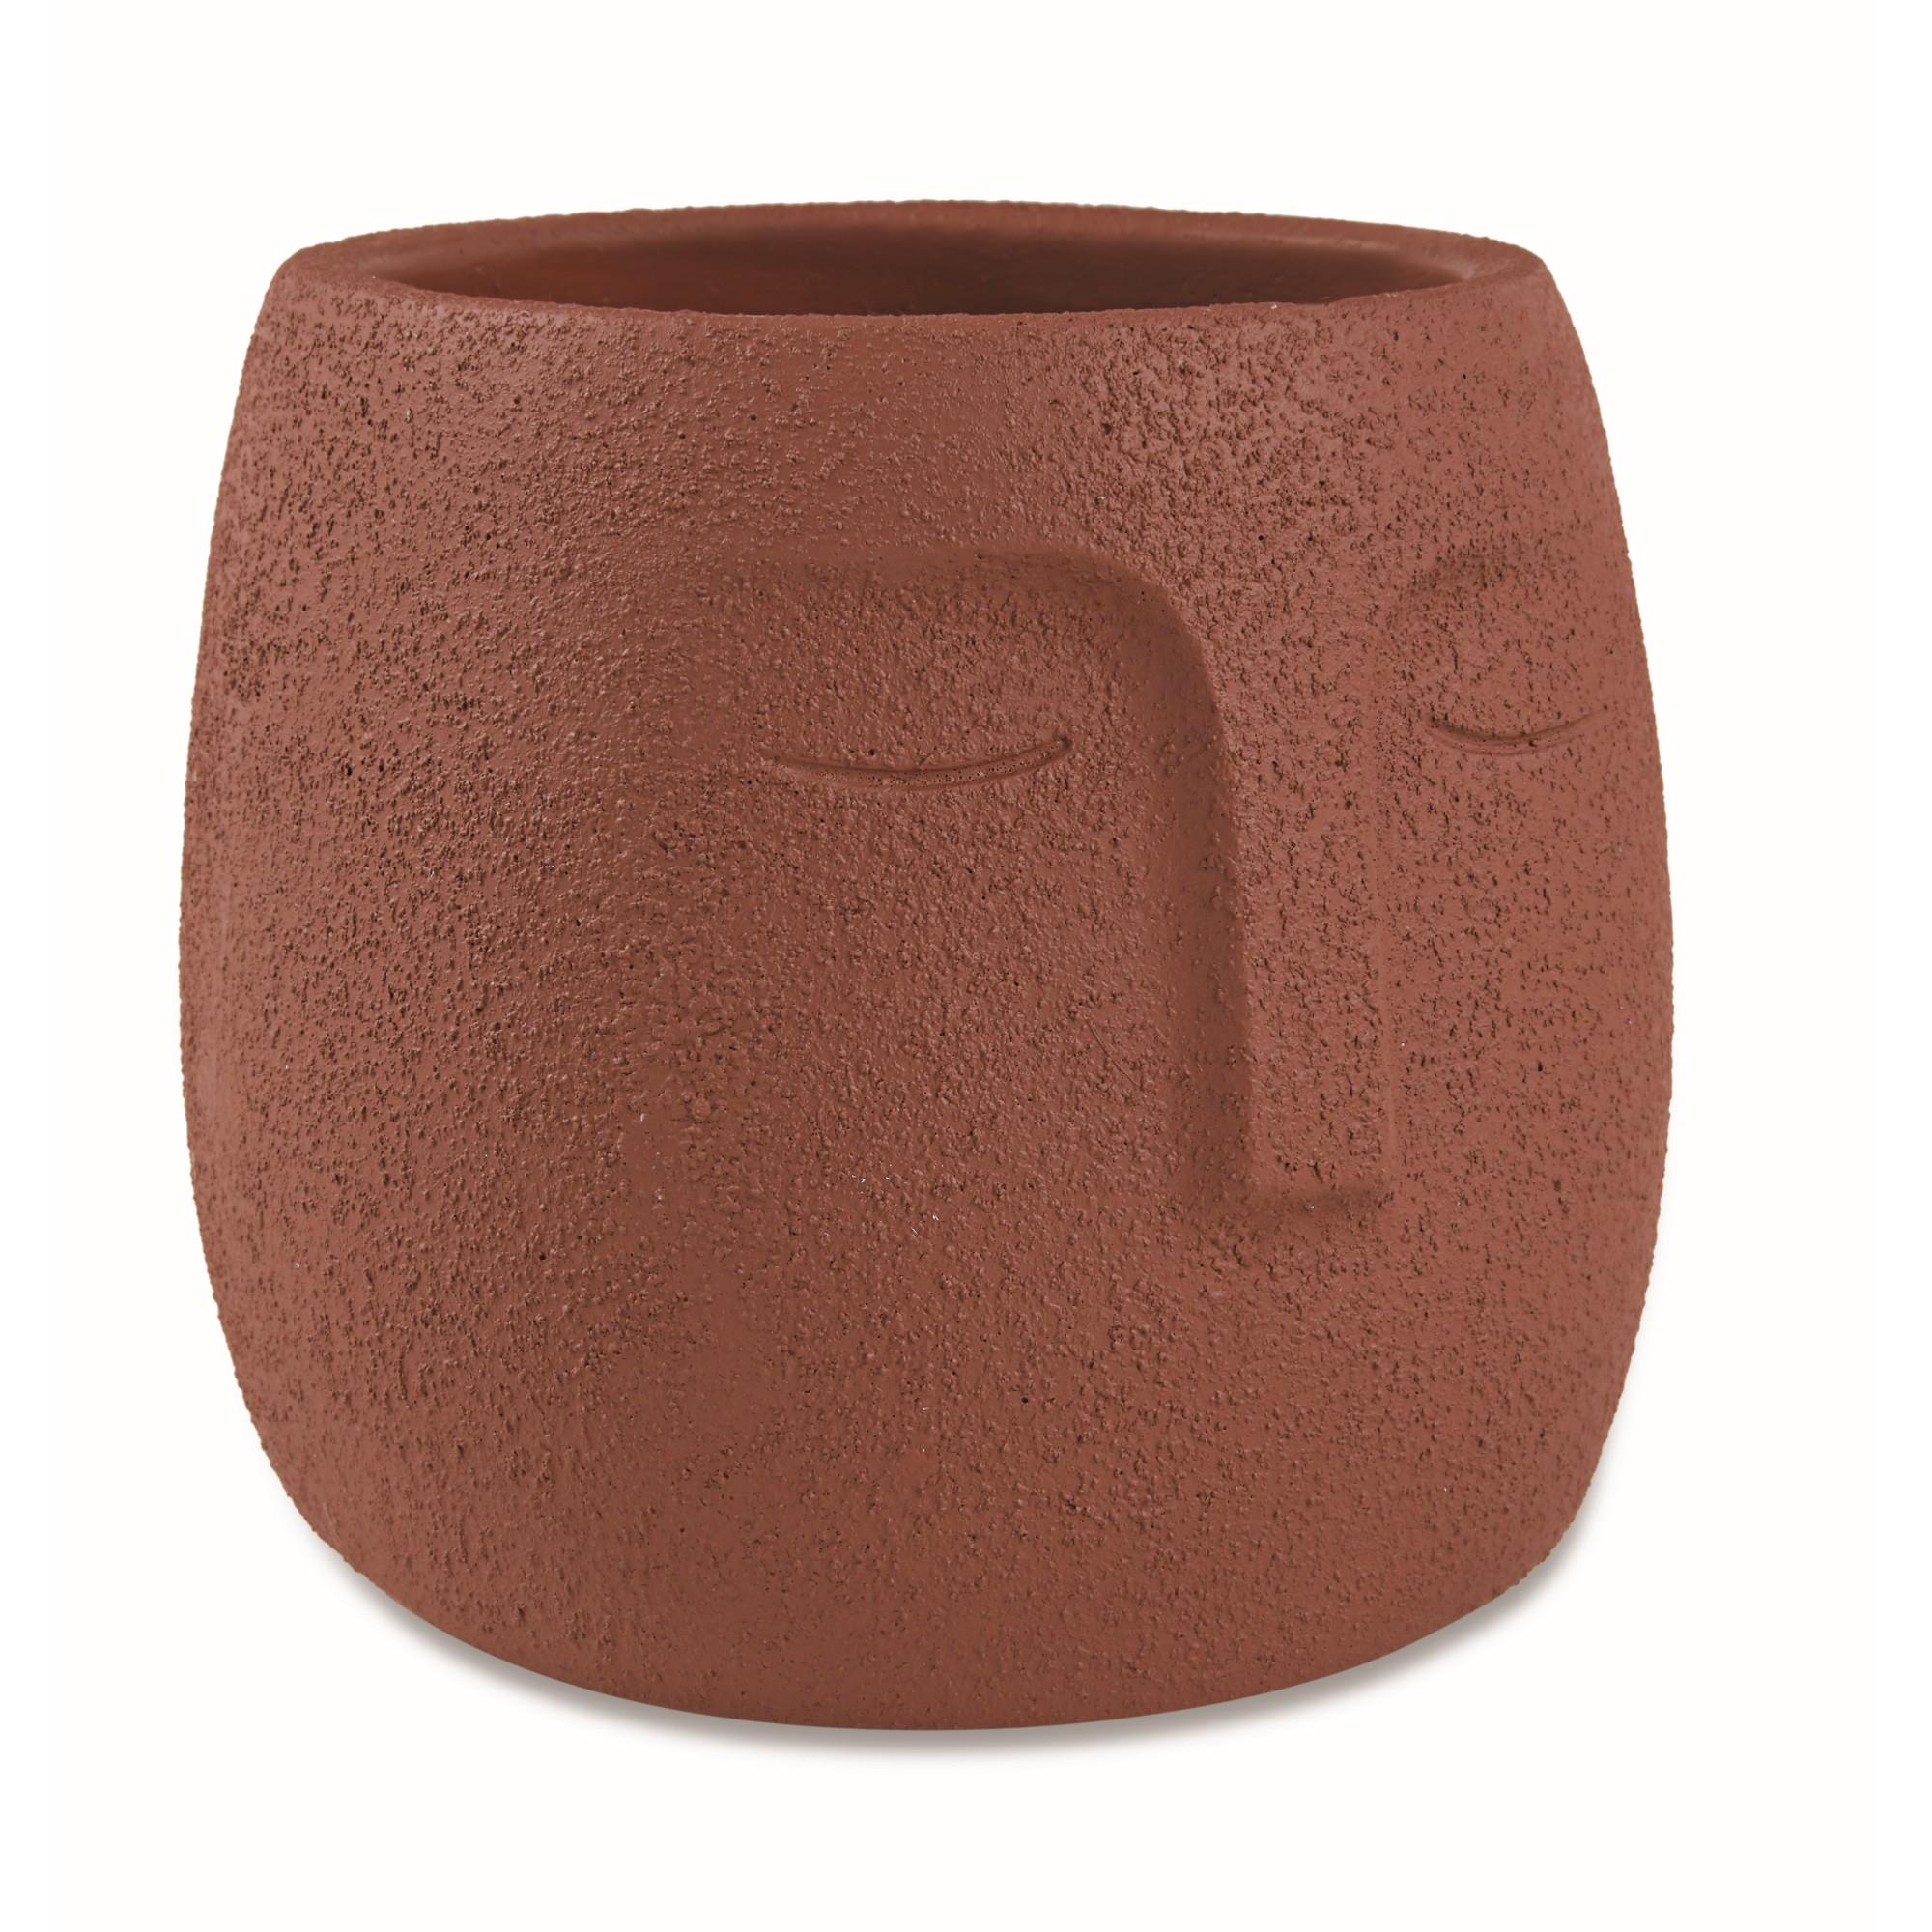 Cachepot Cimento 14x1450 cm Marrom 11911 - Mart